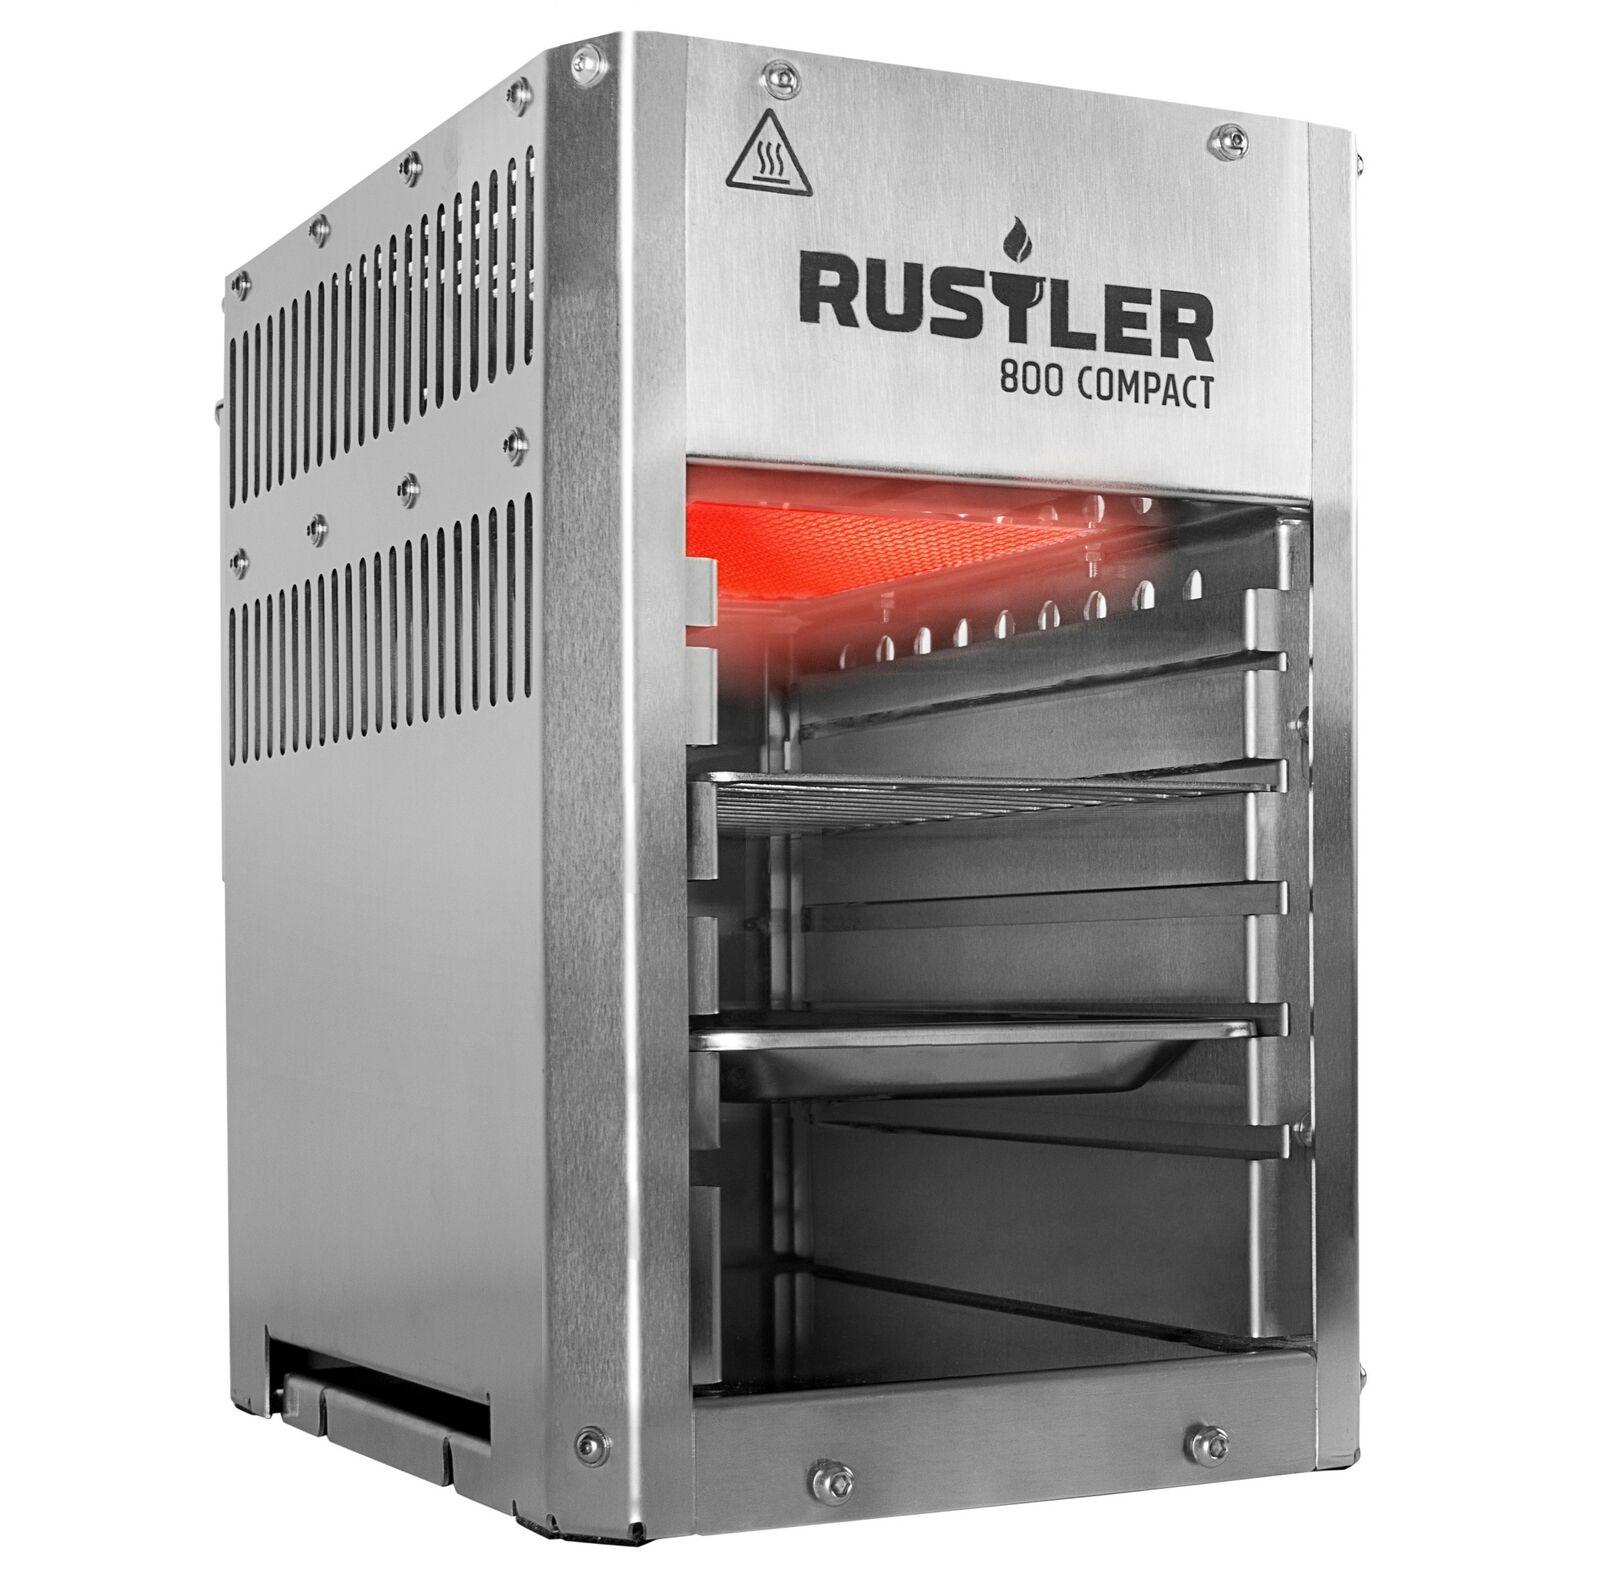 Rustler 800 Compact Oberhitze Gasgrill aus Edelstahl bis zu 800° C